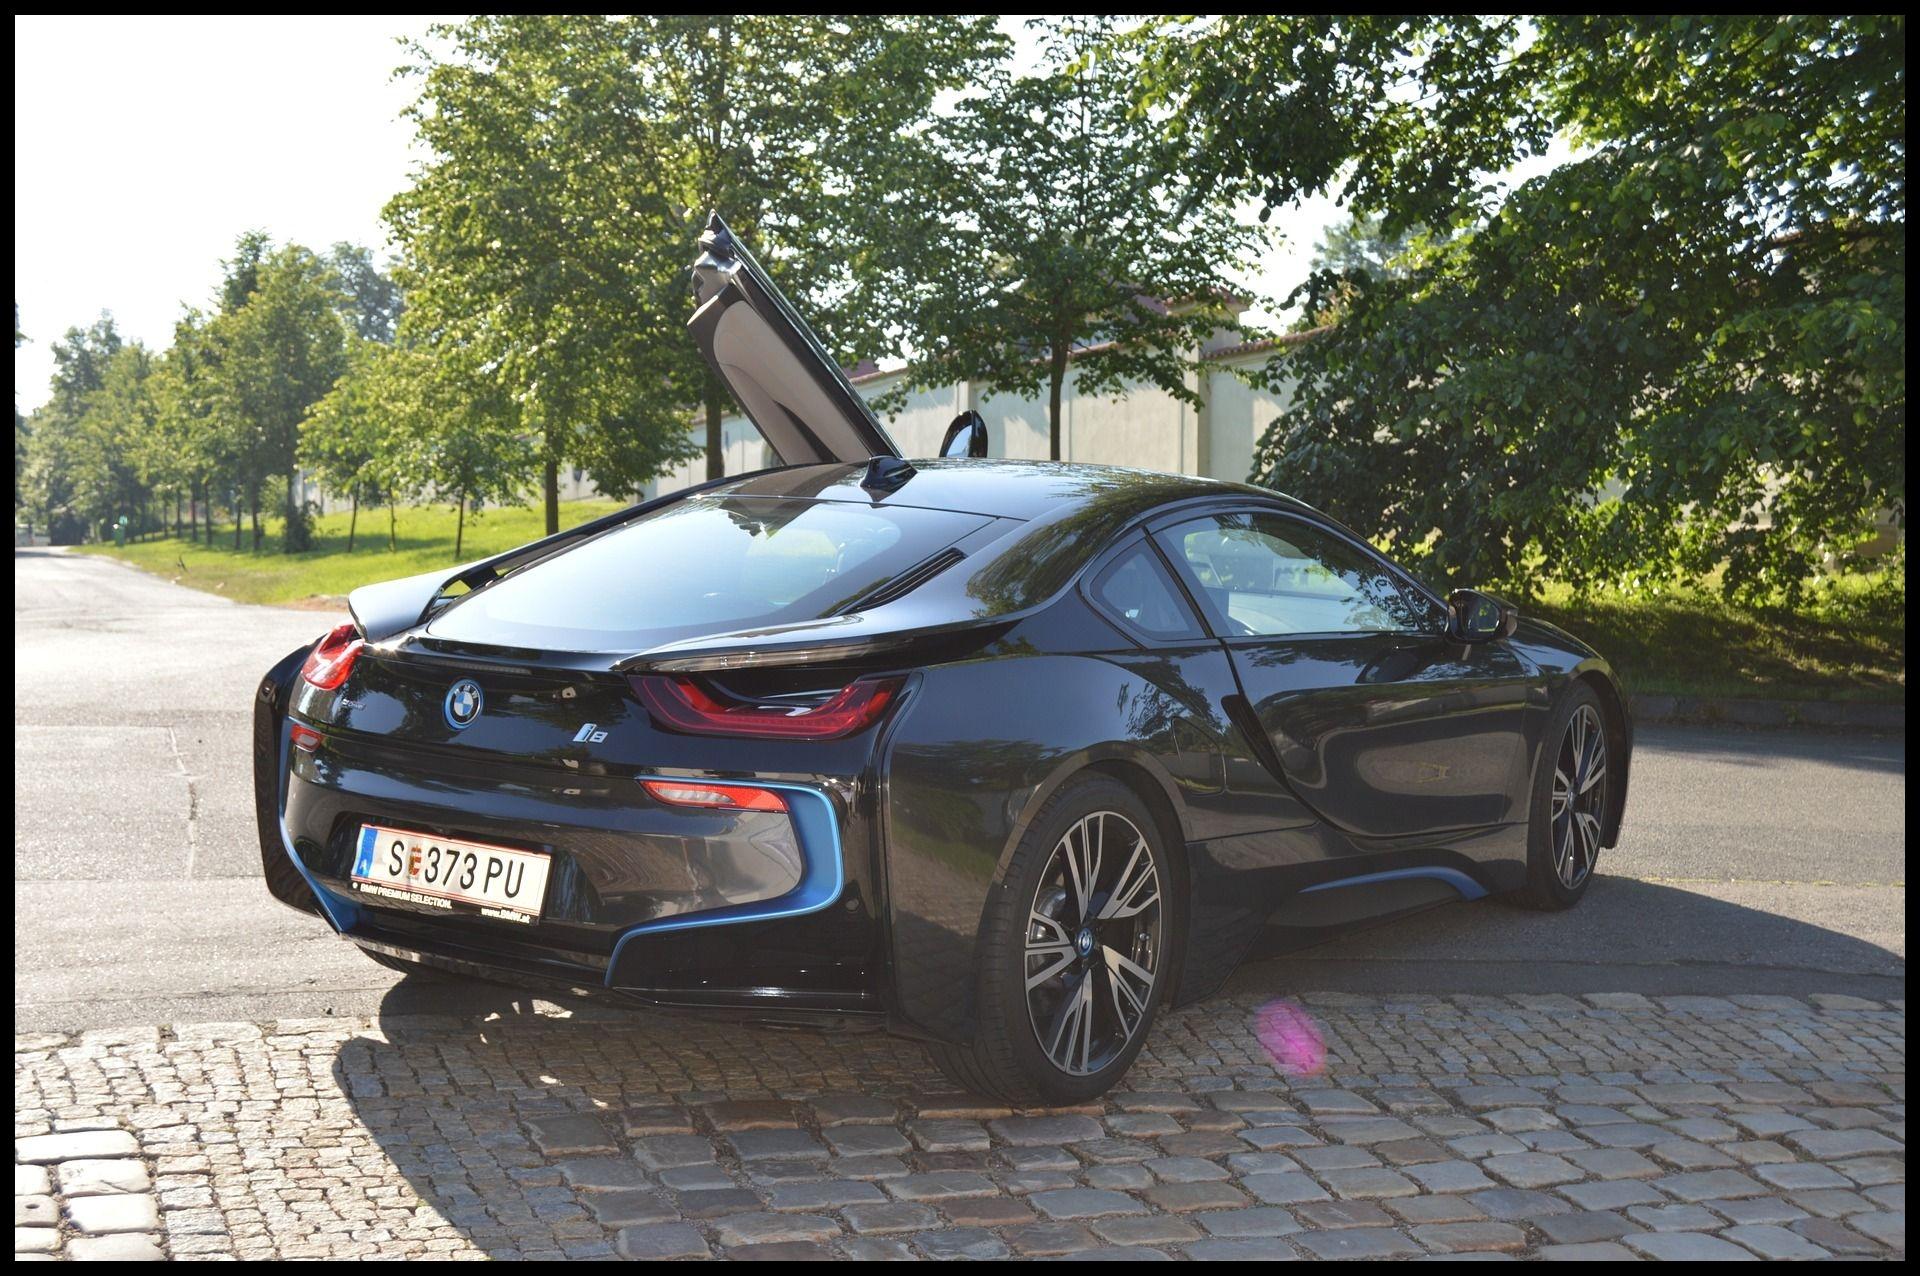 Stunning BMW i8